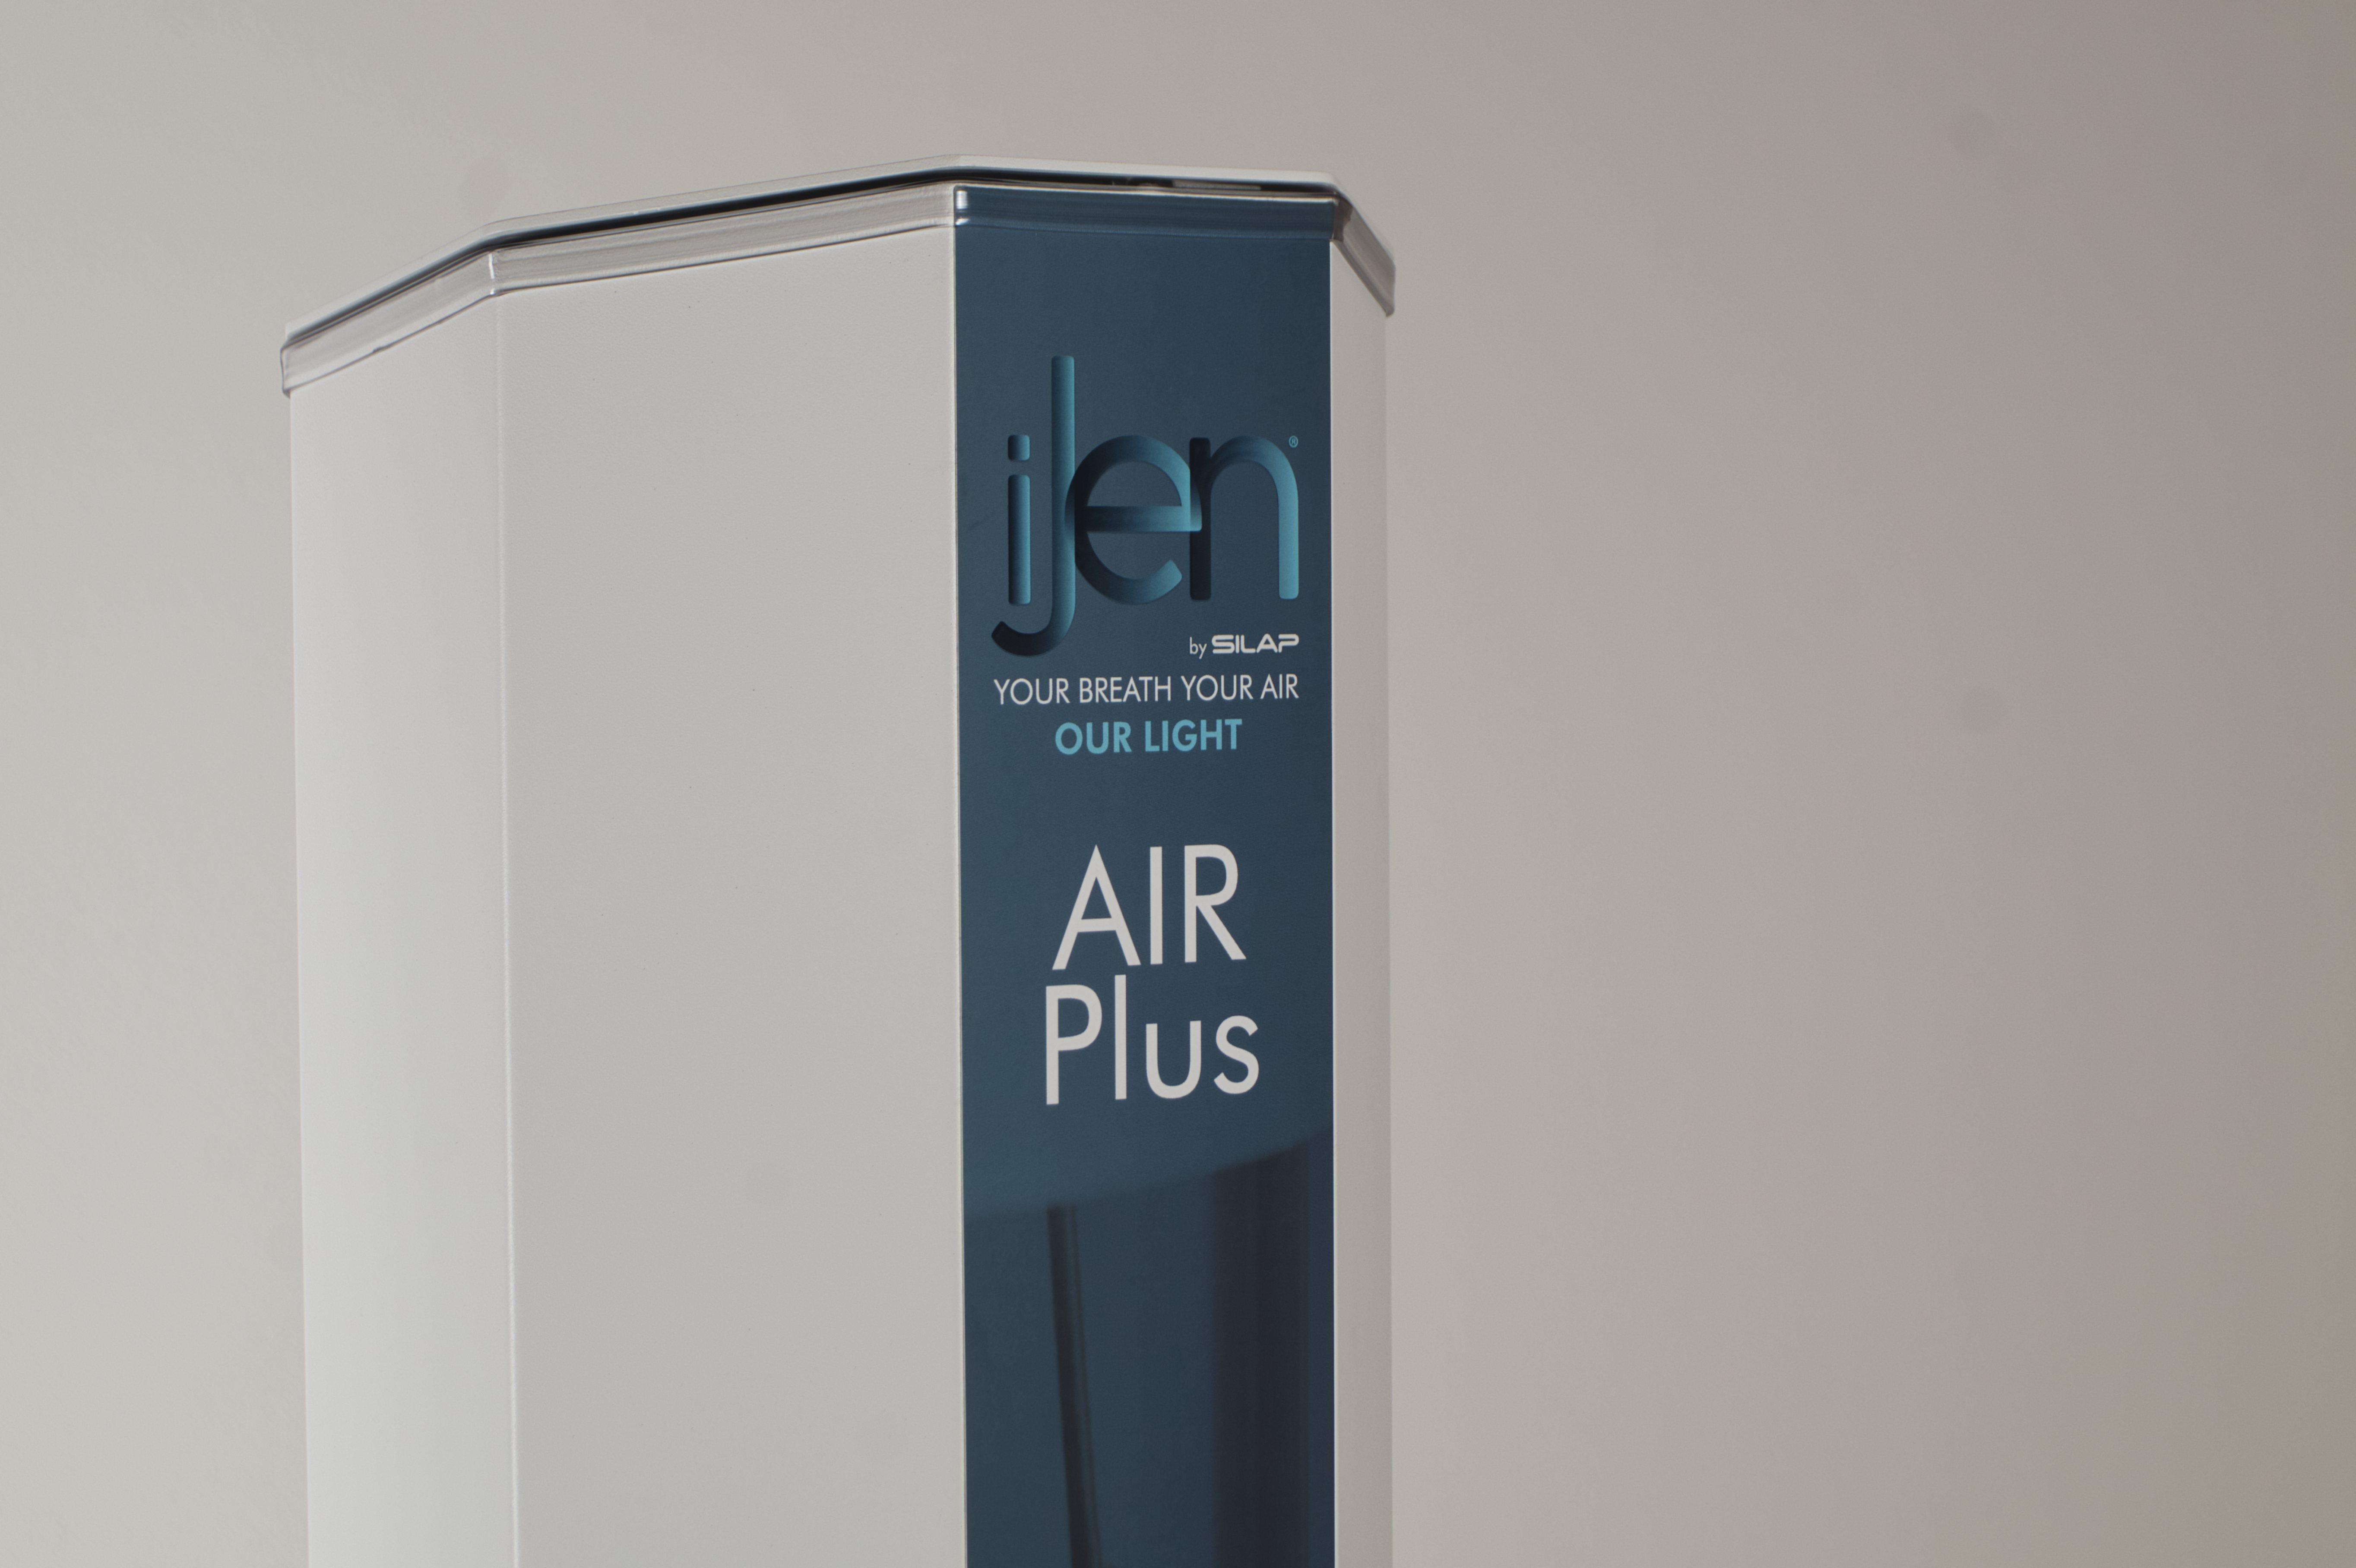 iJen AIR Plus 01